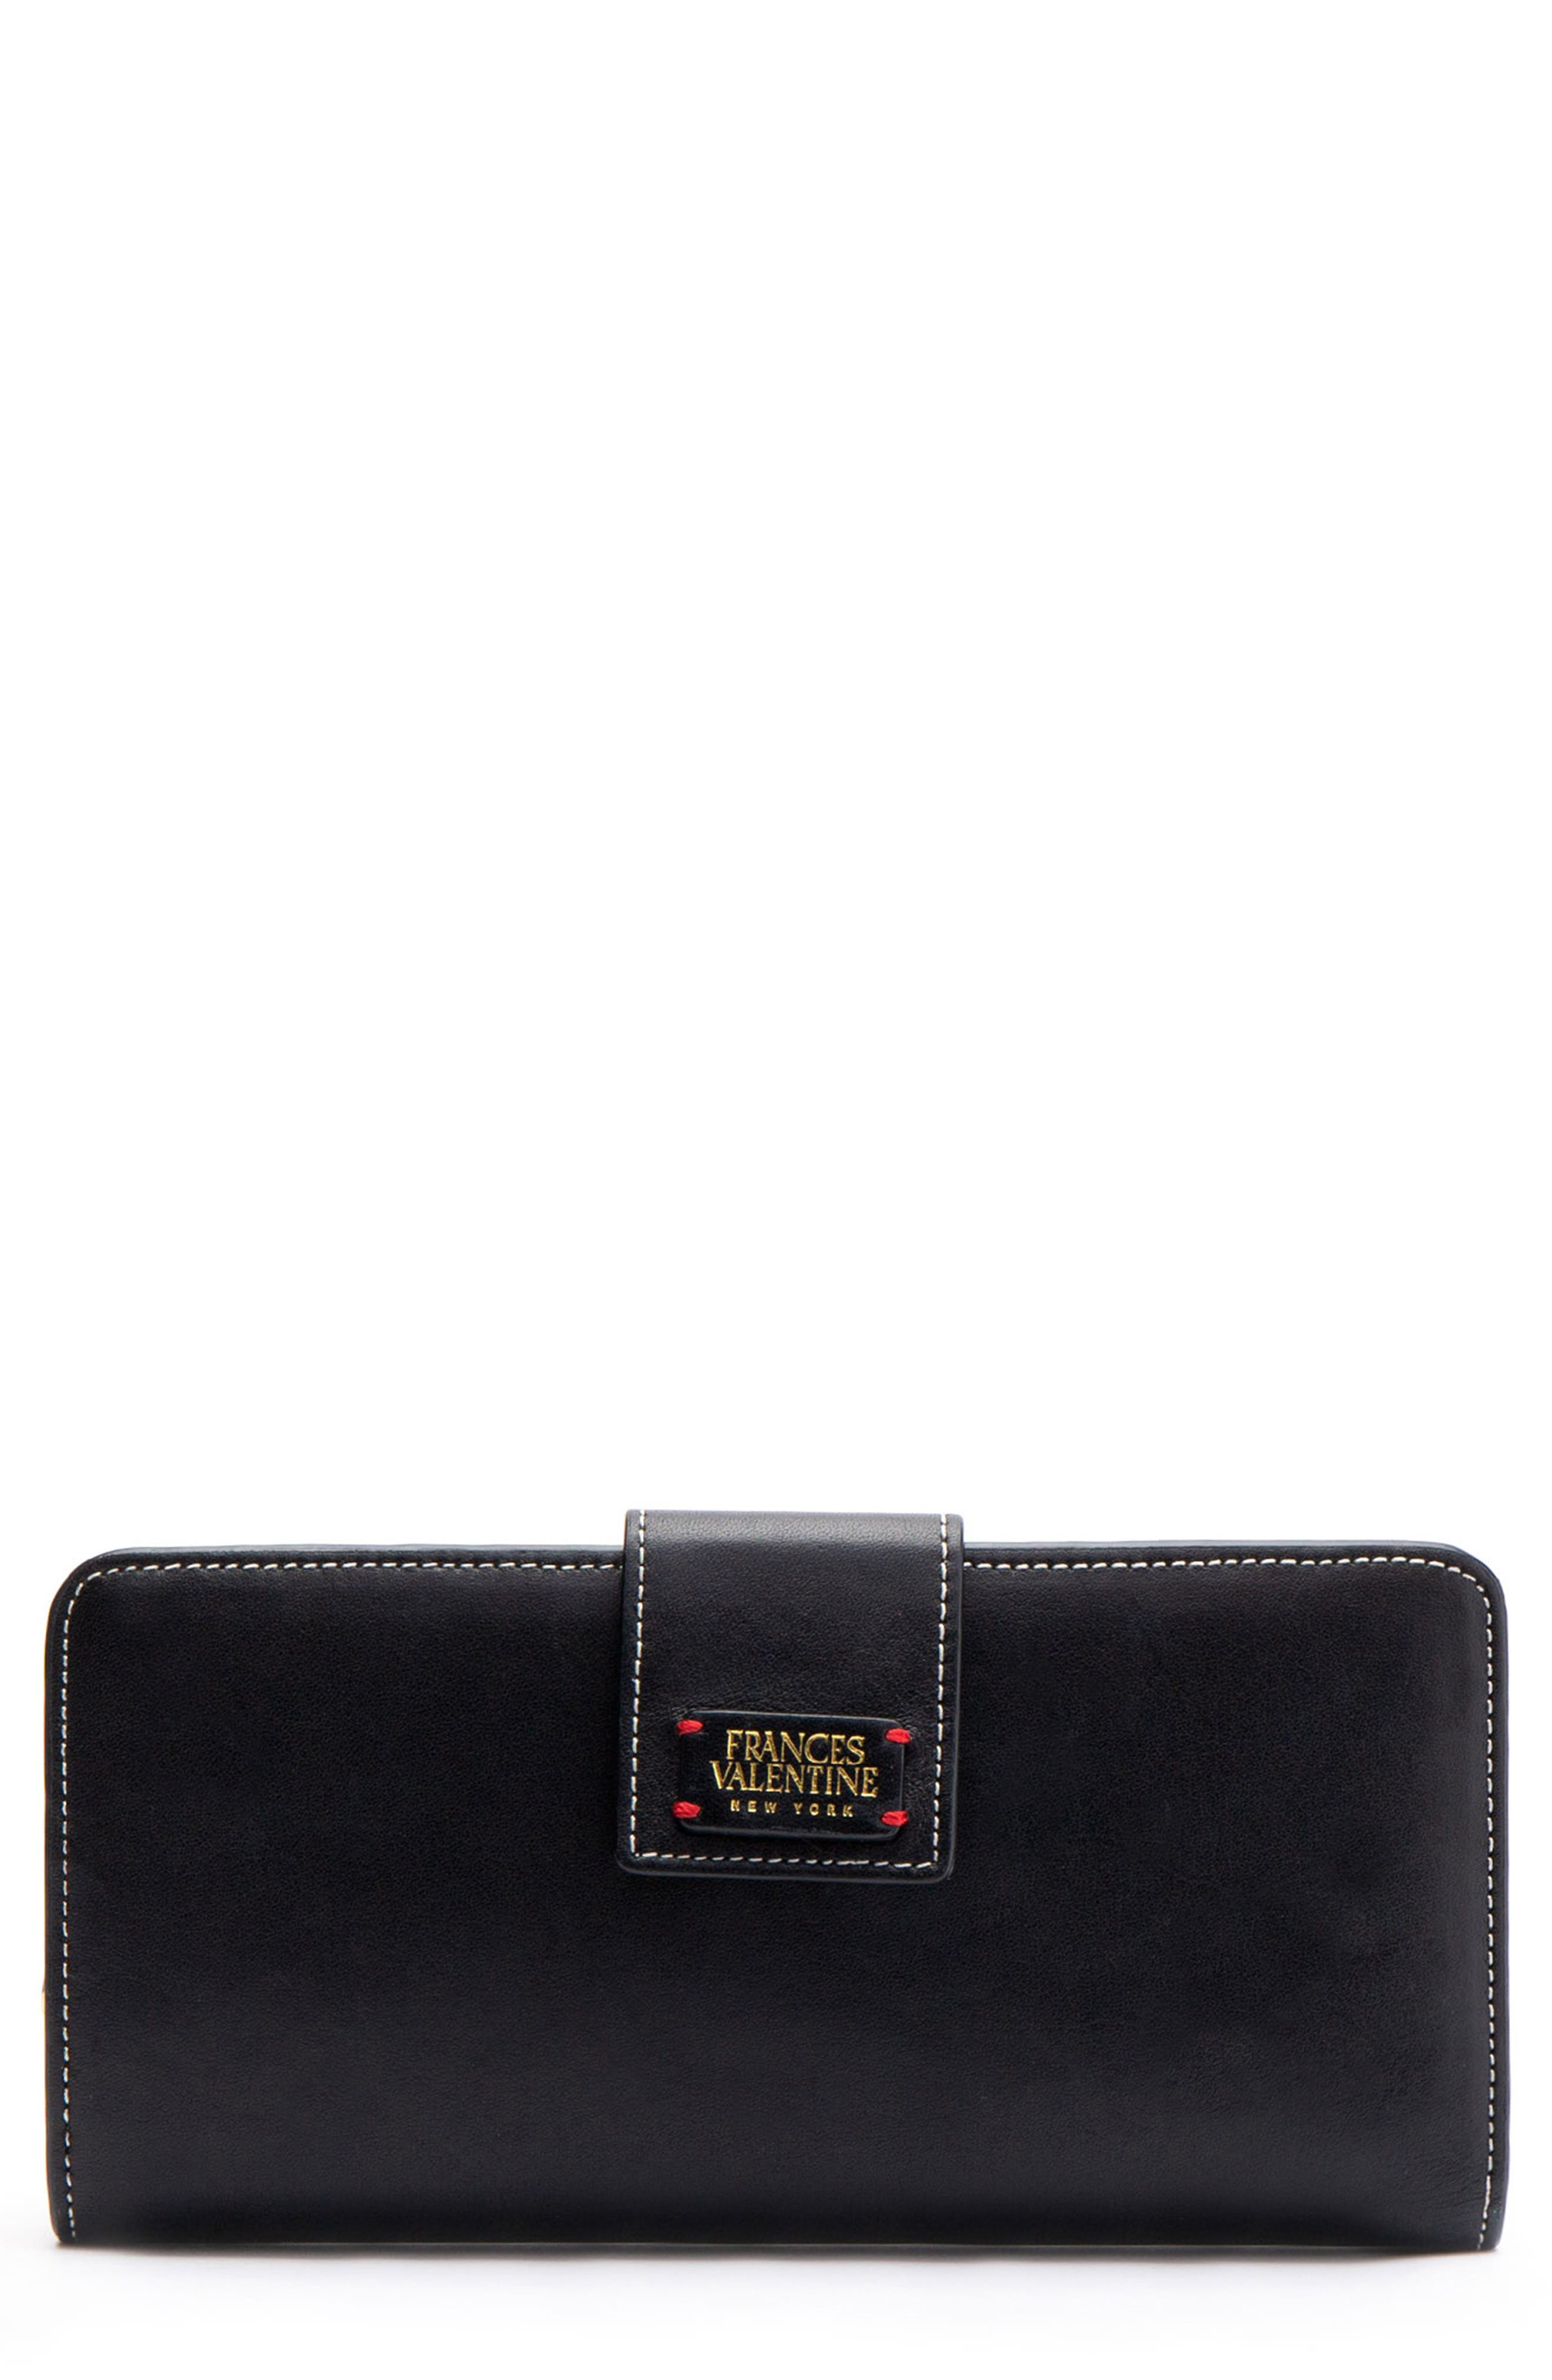 Jefferson Slim Calfskin Leather Wallet,                             Main thumbnail 1, color,                             BLACK/ OYSTER